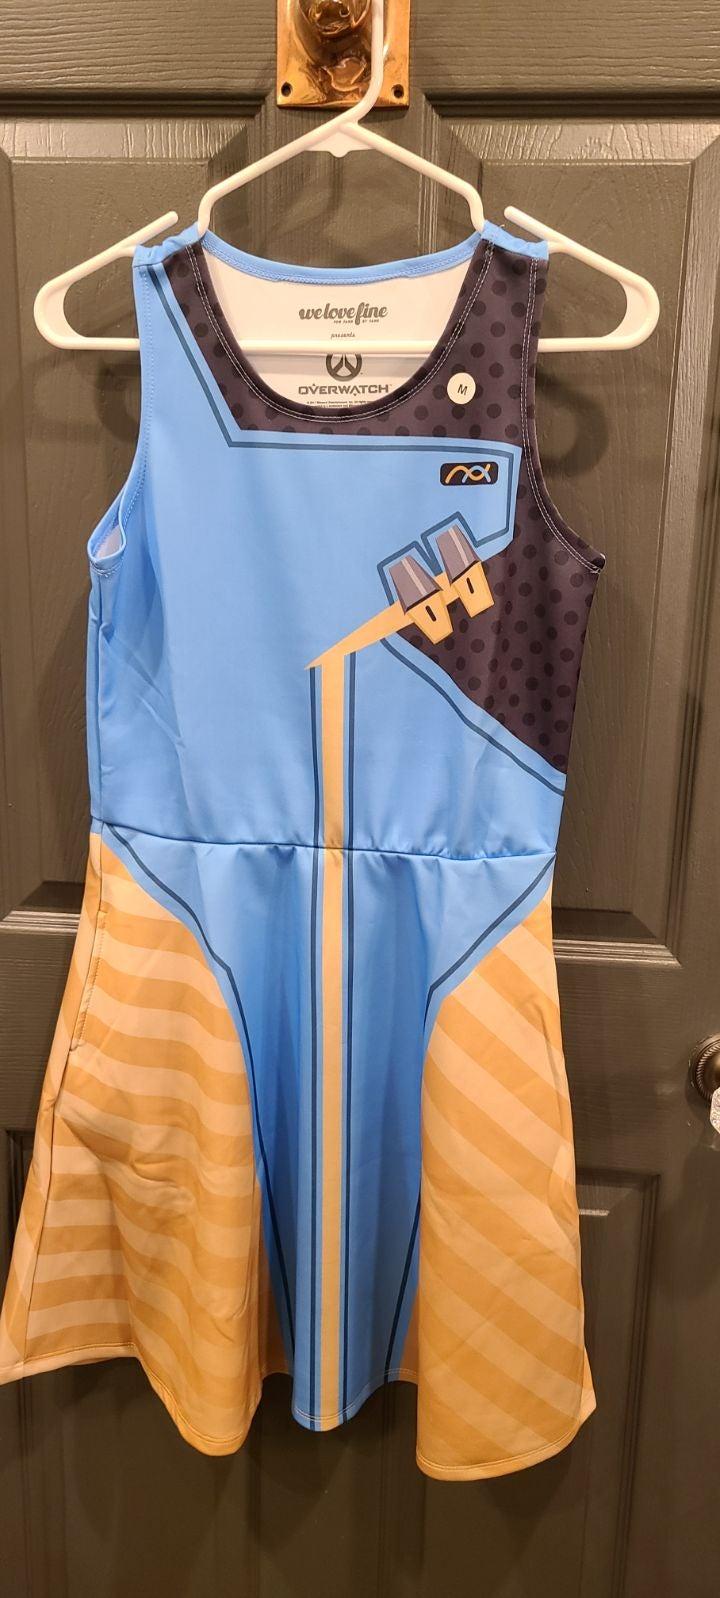 Overwatch Dress M